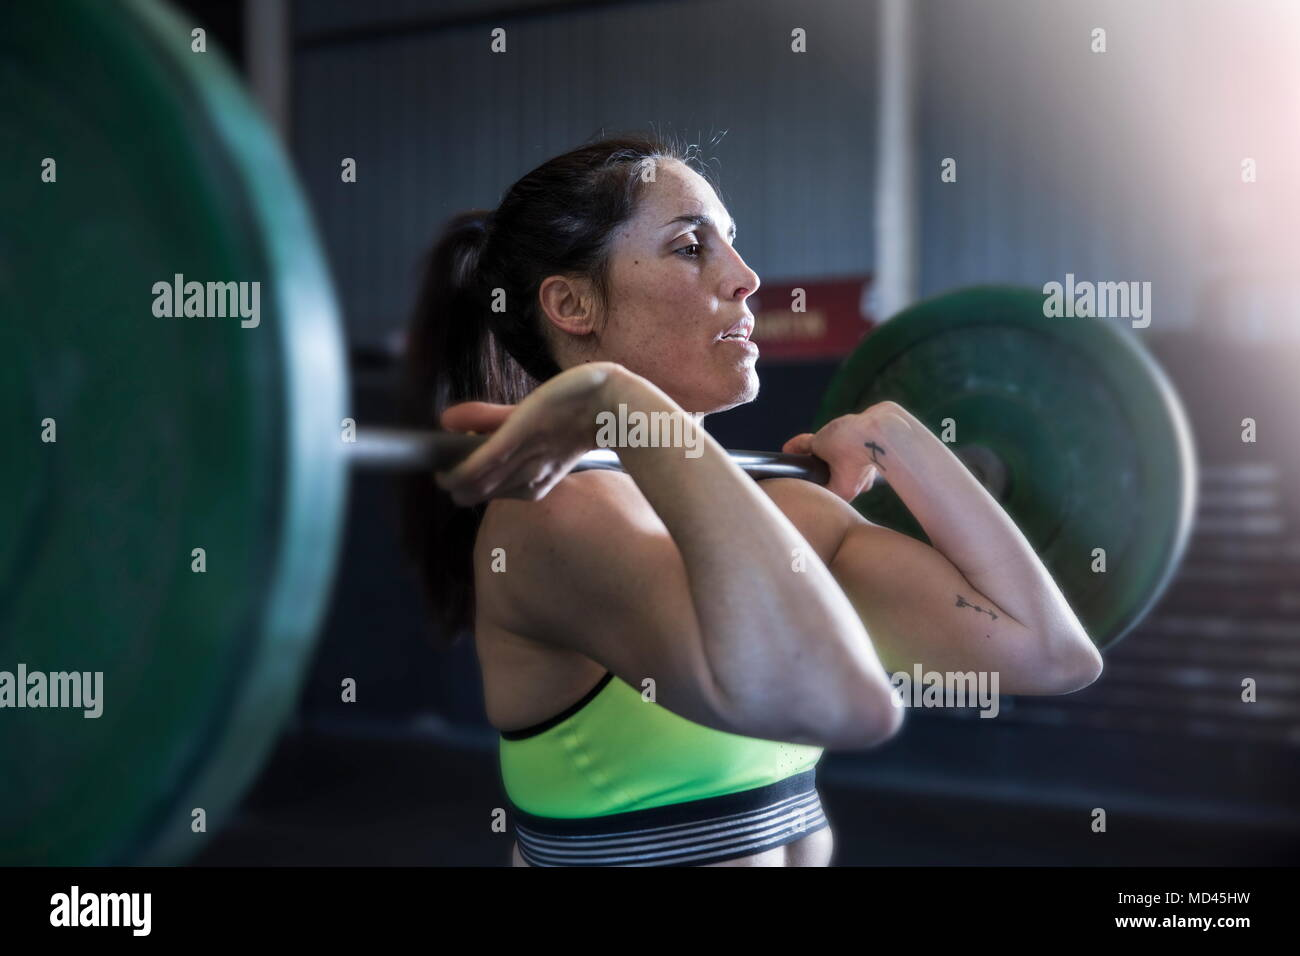 Frau trainieren im Fitnessraum, mit Langhantel Stockbild